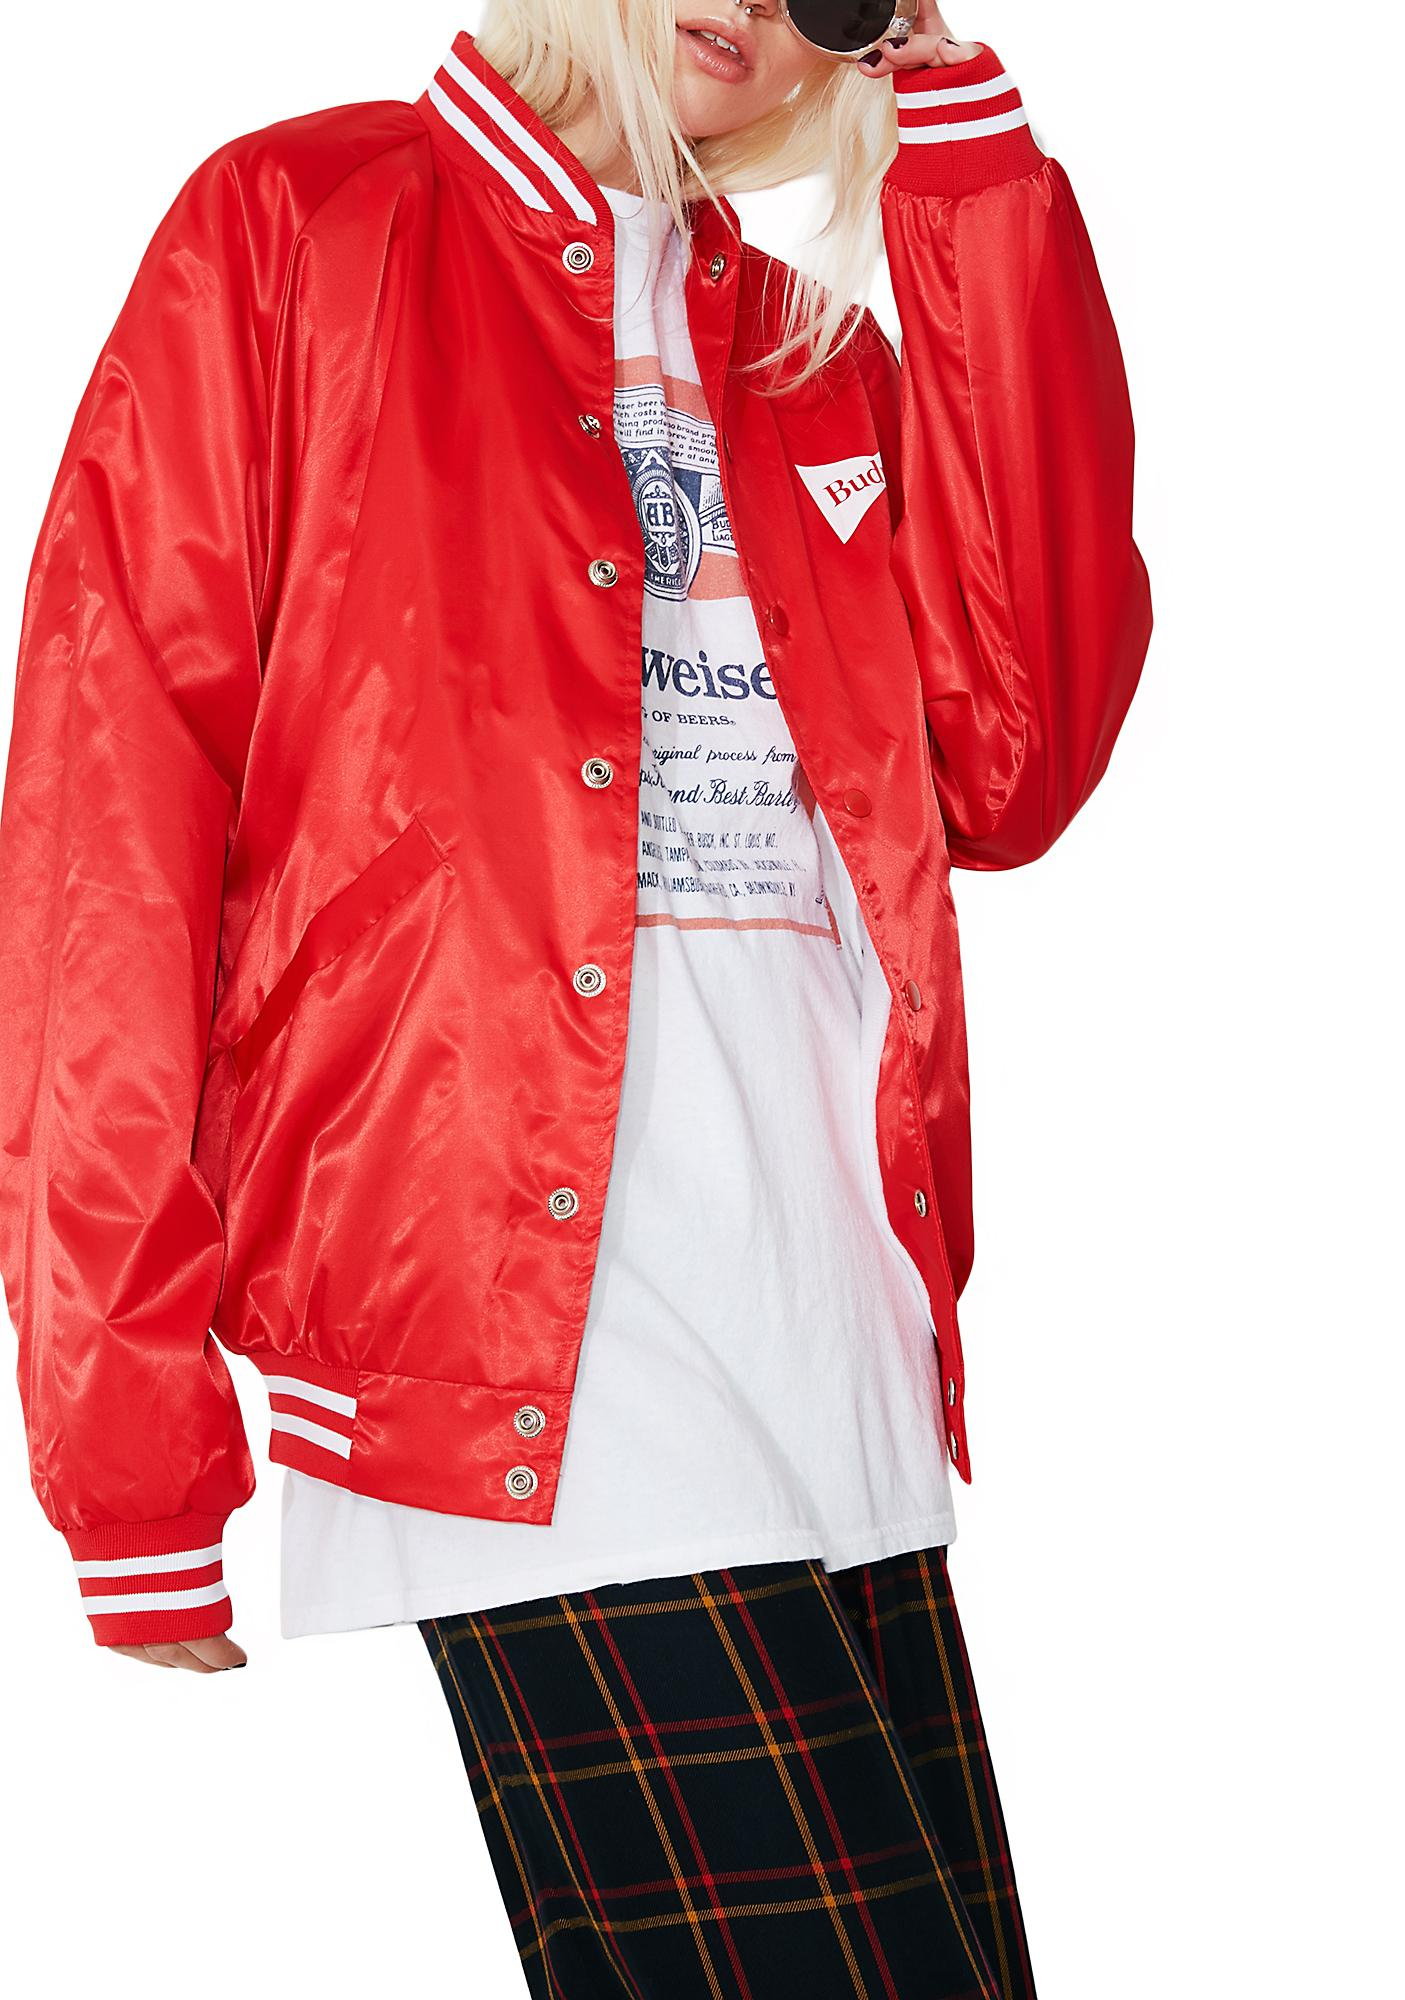 Junk Food Clothing Budweiser Varsity Jacket